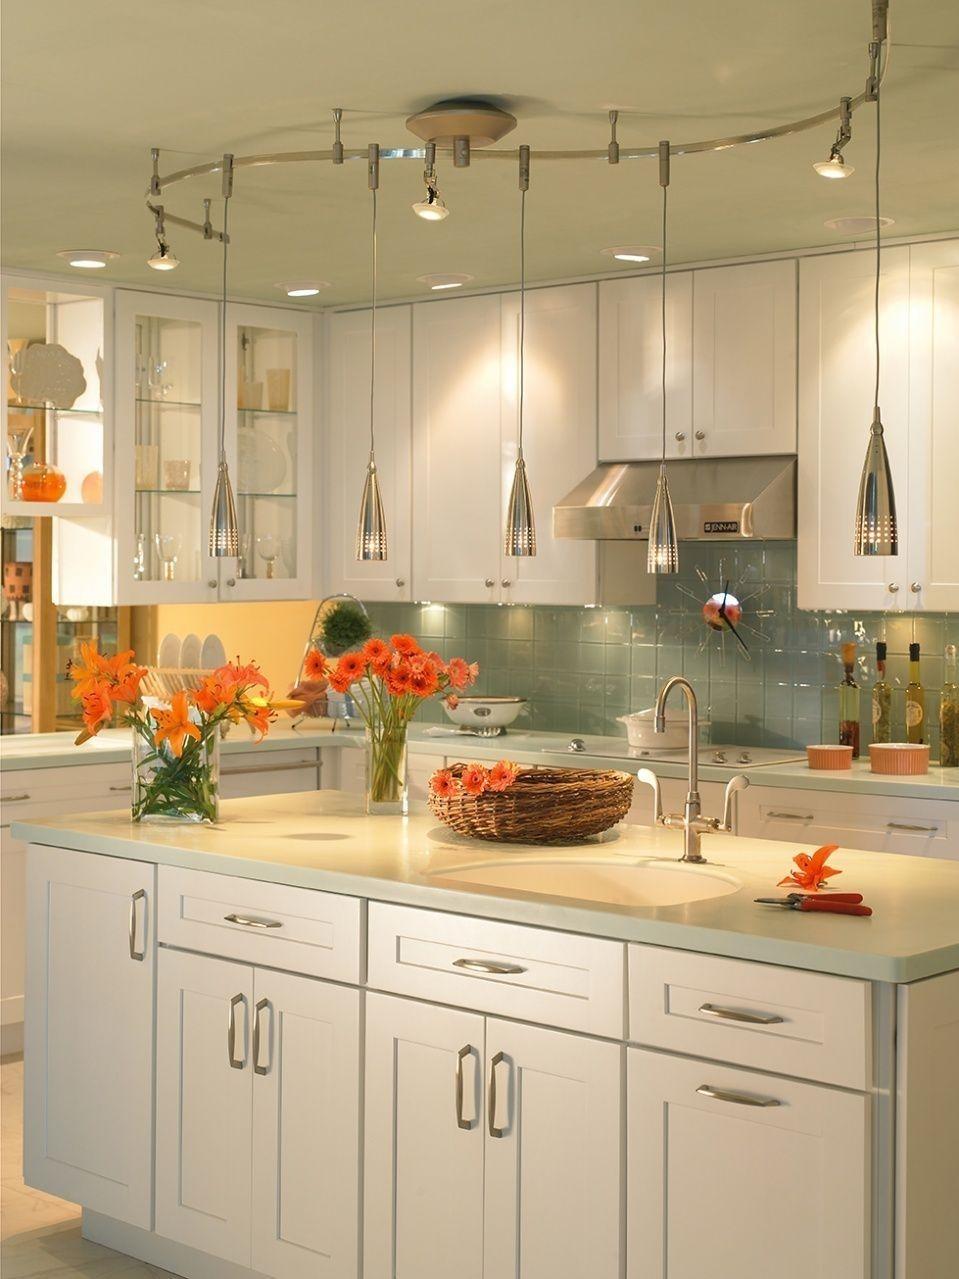 10+ Functional Kitchen Lighting Design Ideas In 2020